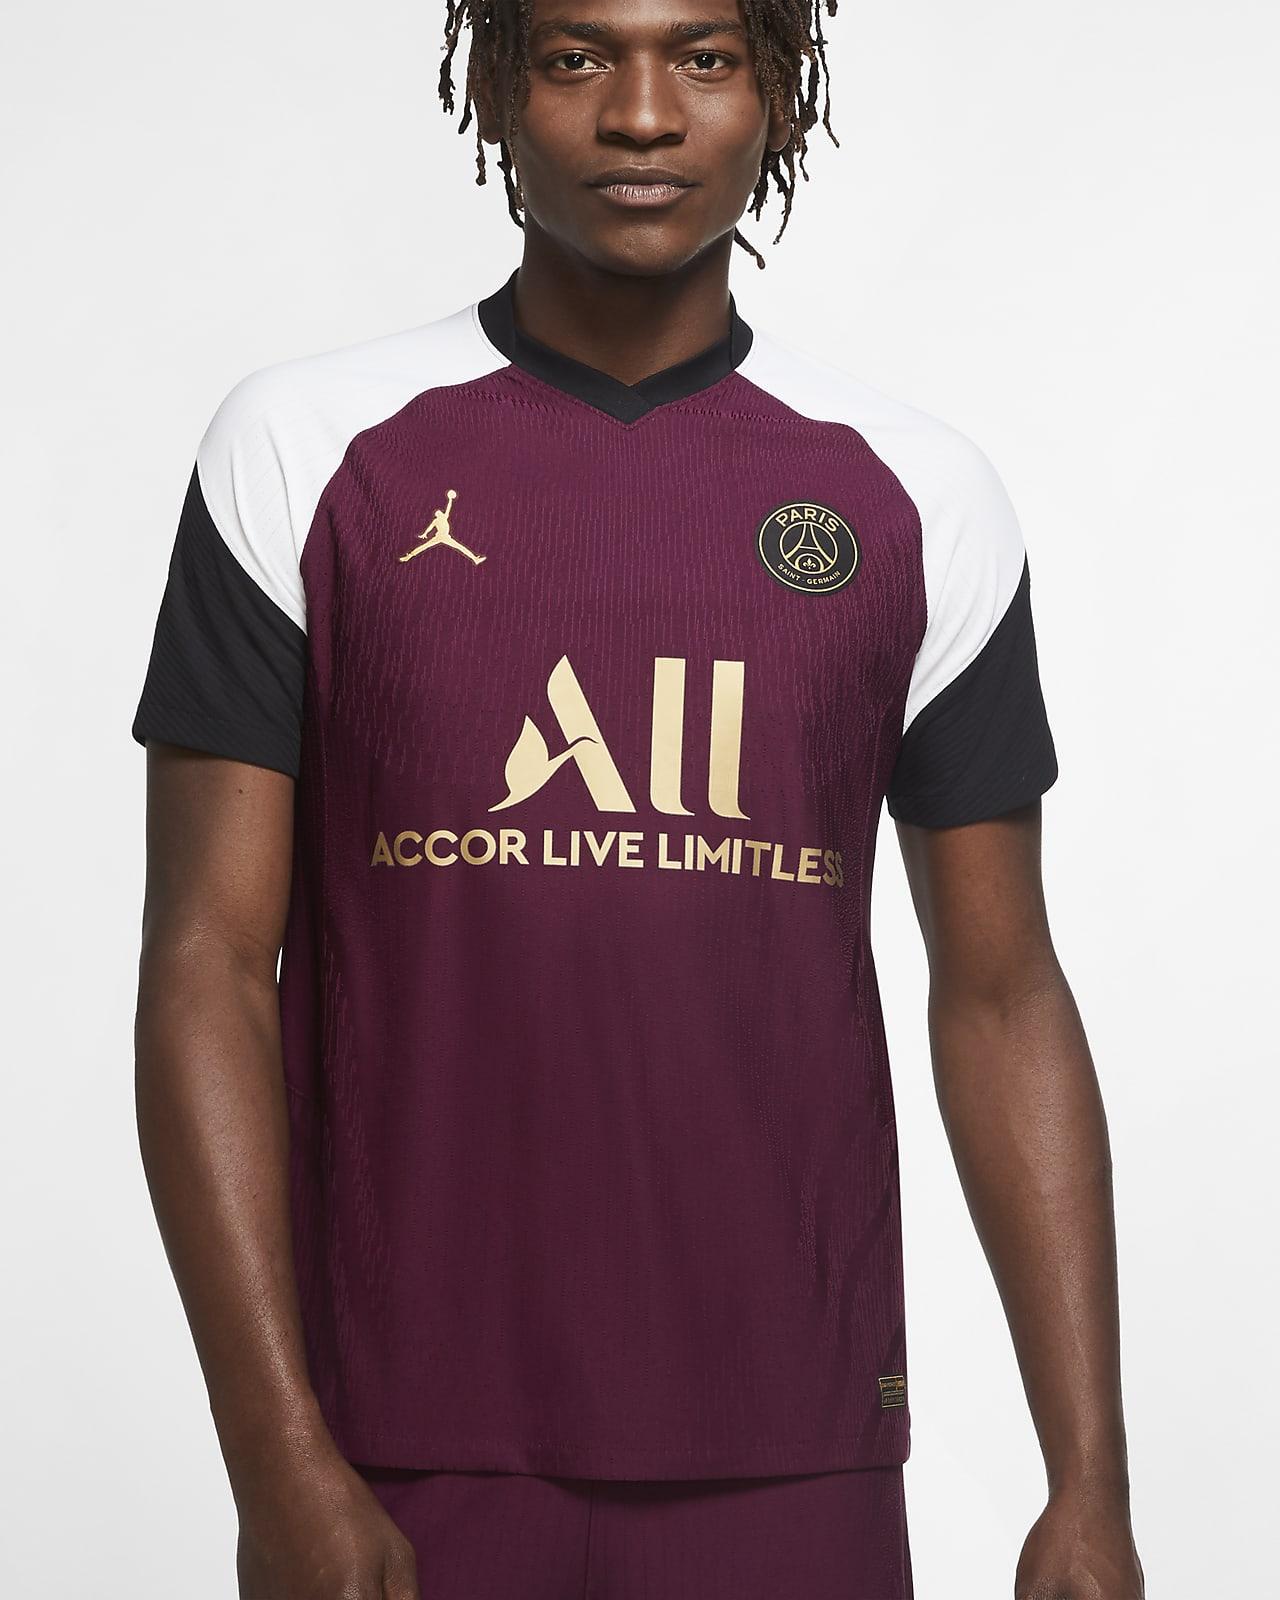 Camiseta de fútbol alternativa para hombre Vapor Match del Paris Saint-Germain 2020/21